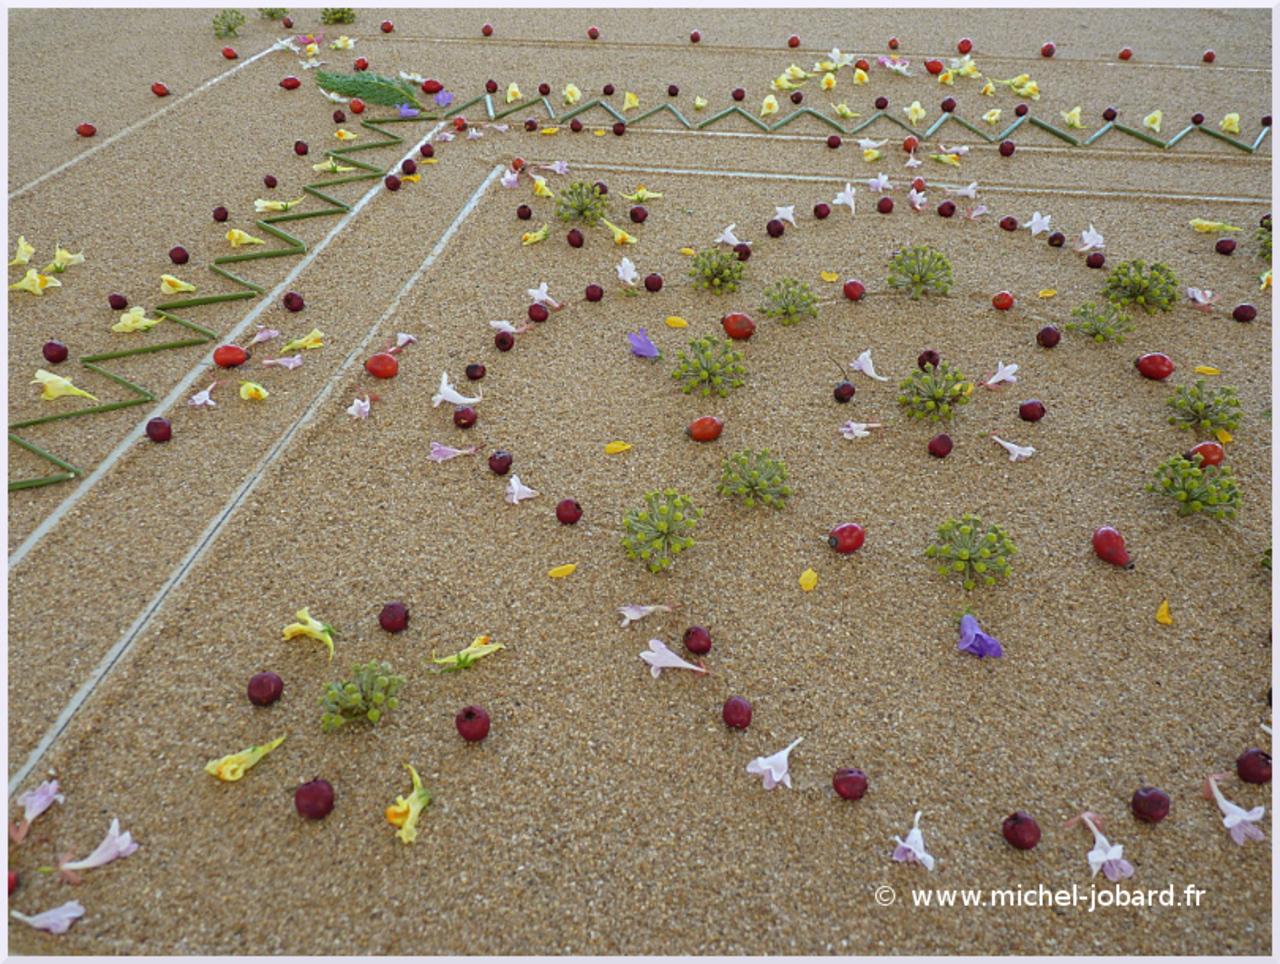 Land-art-mandala-de-la-clairière-06.jpg